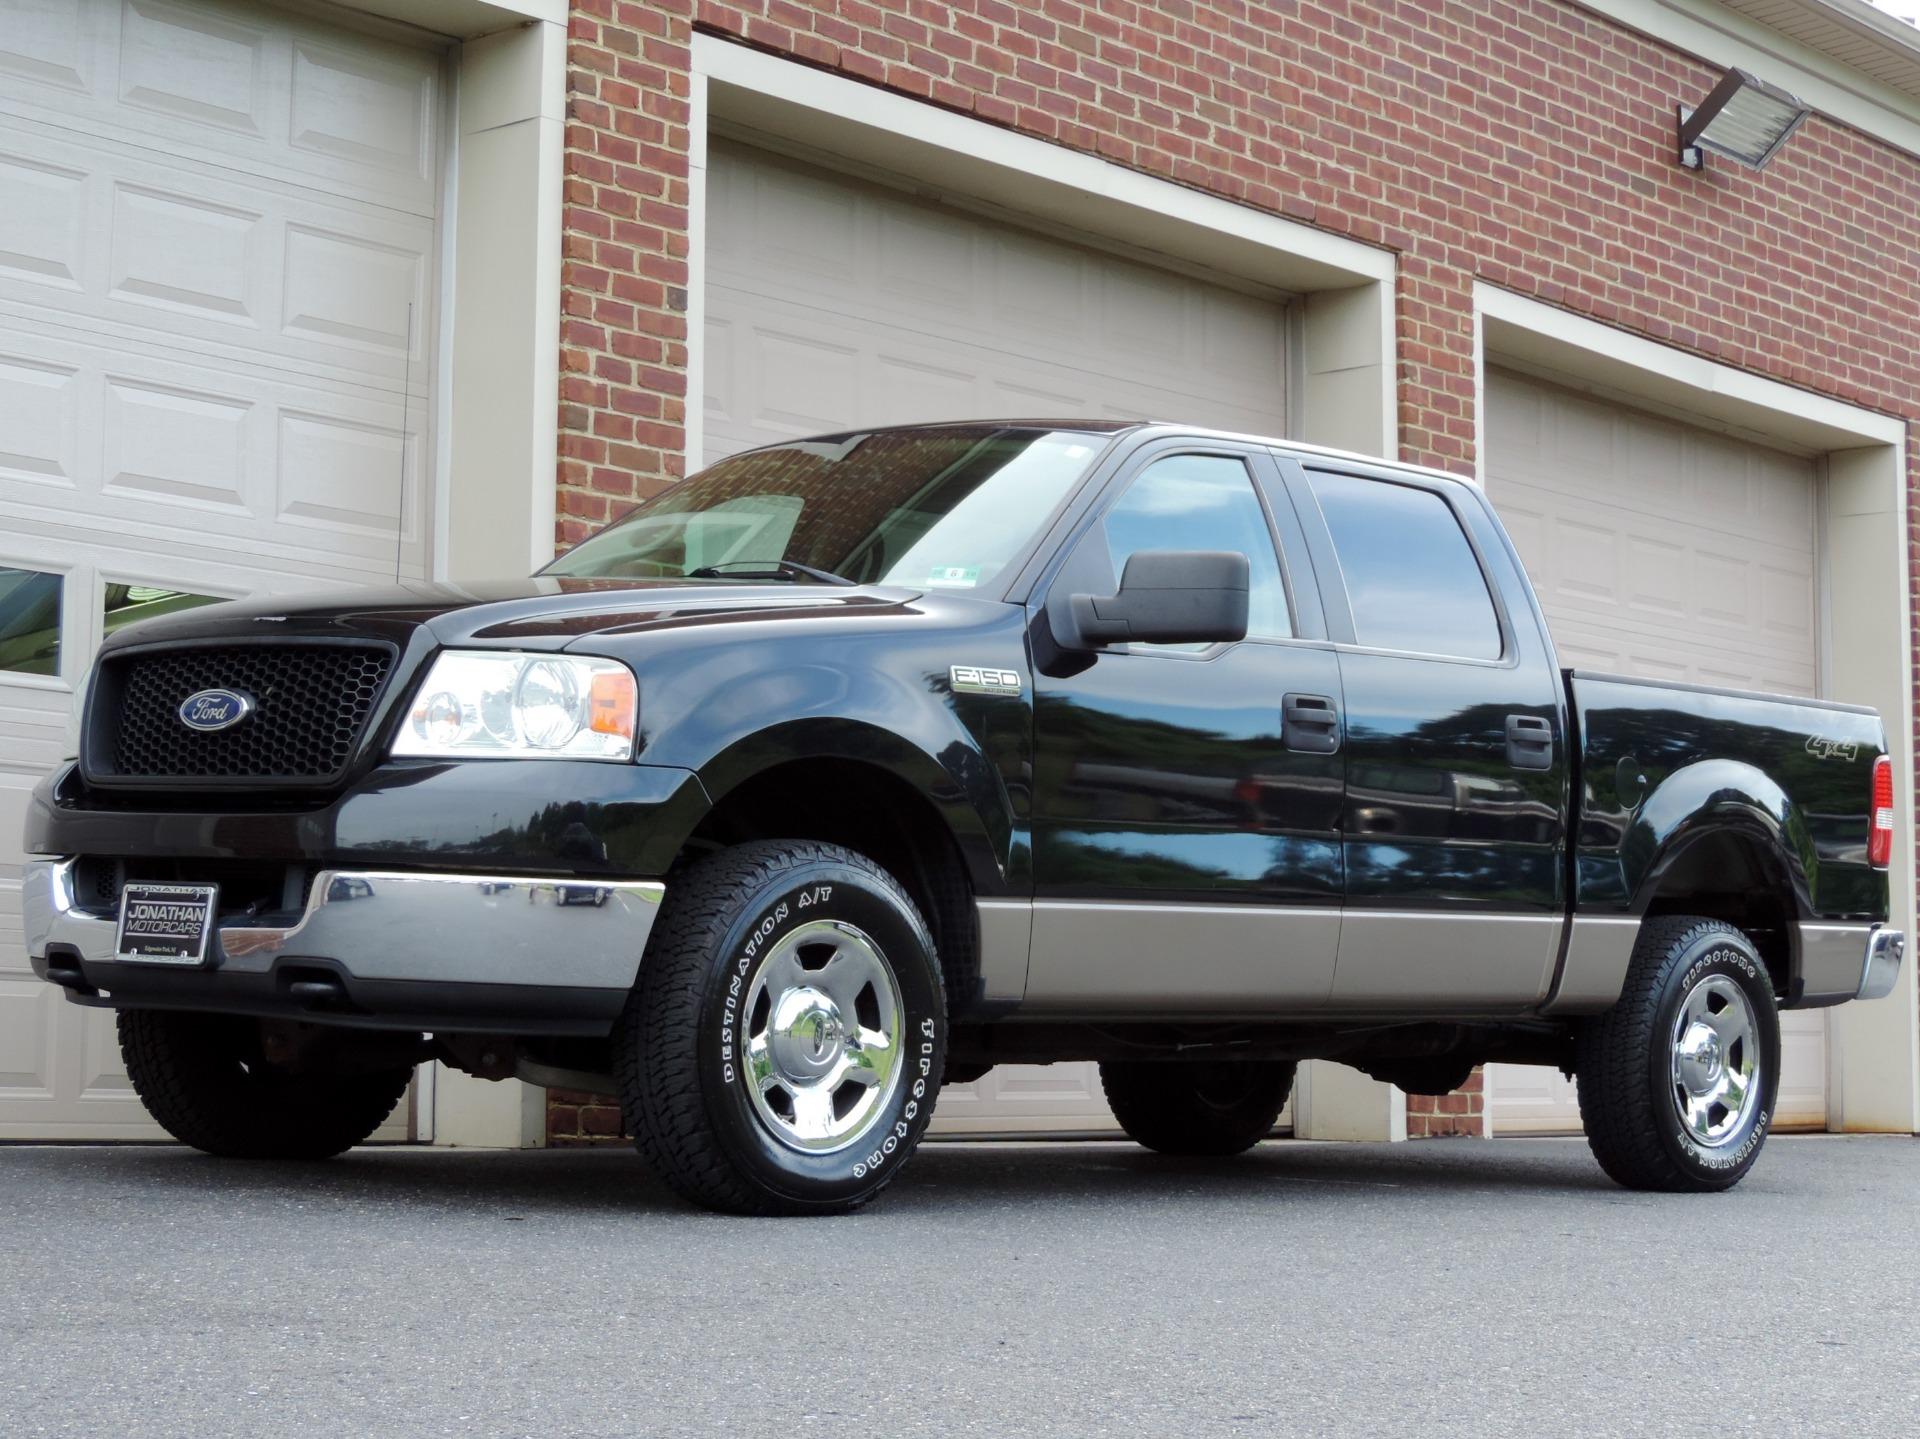 Used-2005-Ford-F-150-XLT-Super-Crew-4X4